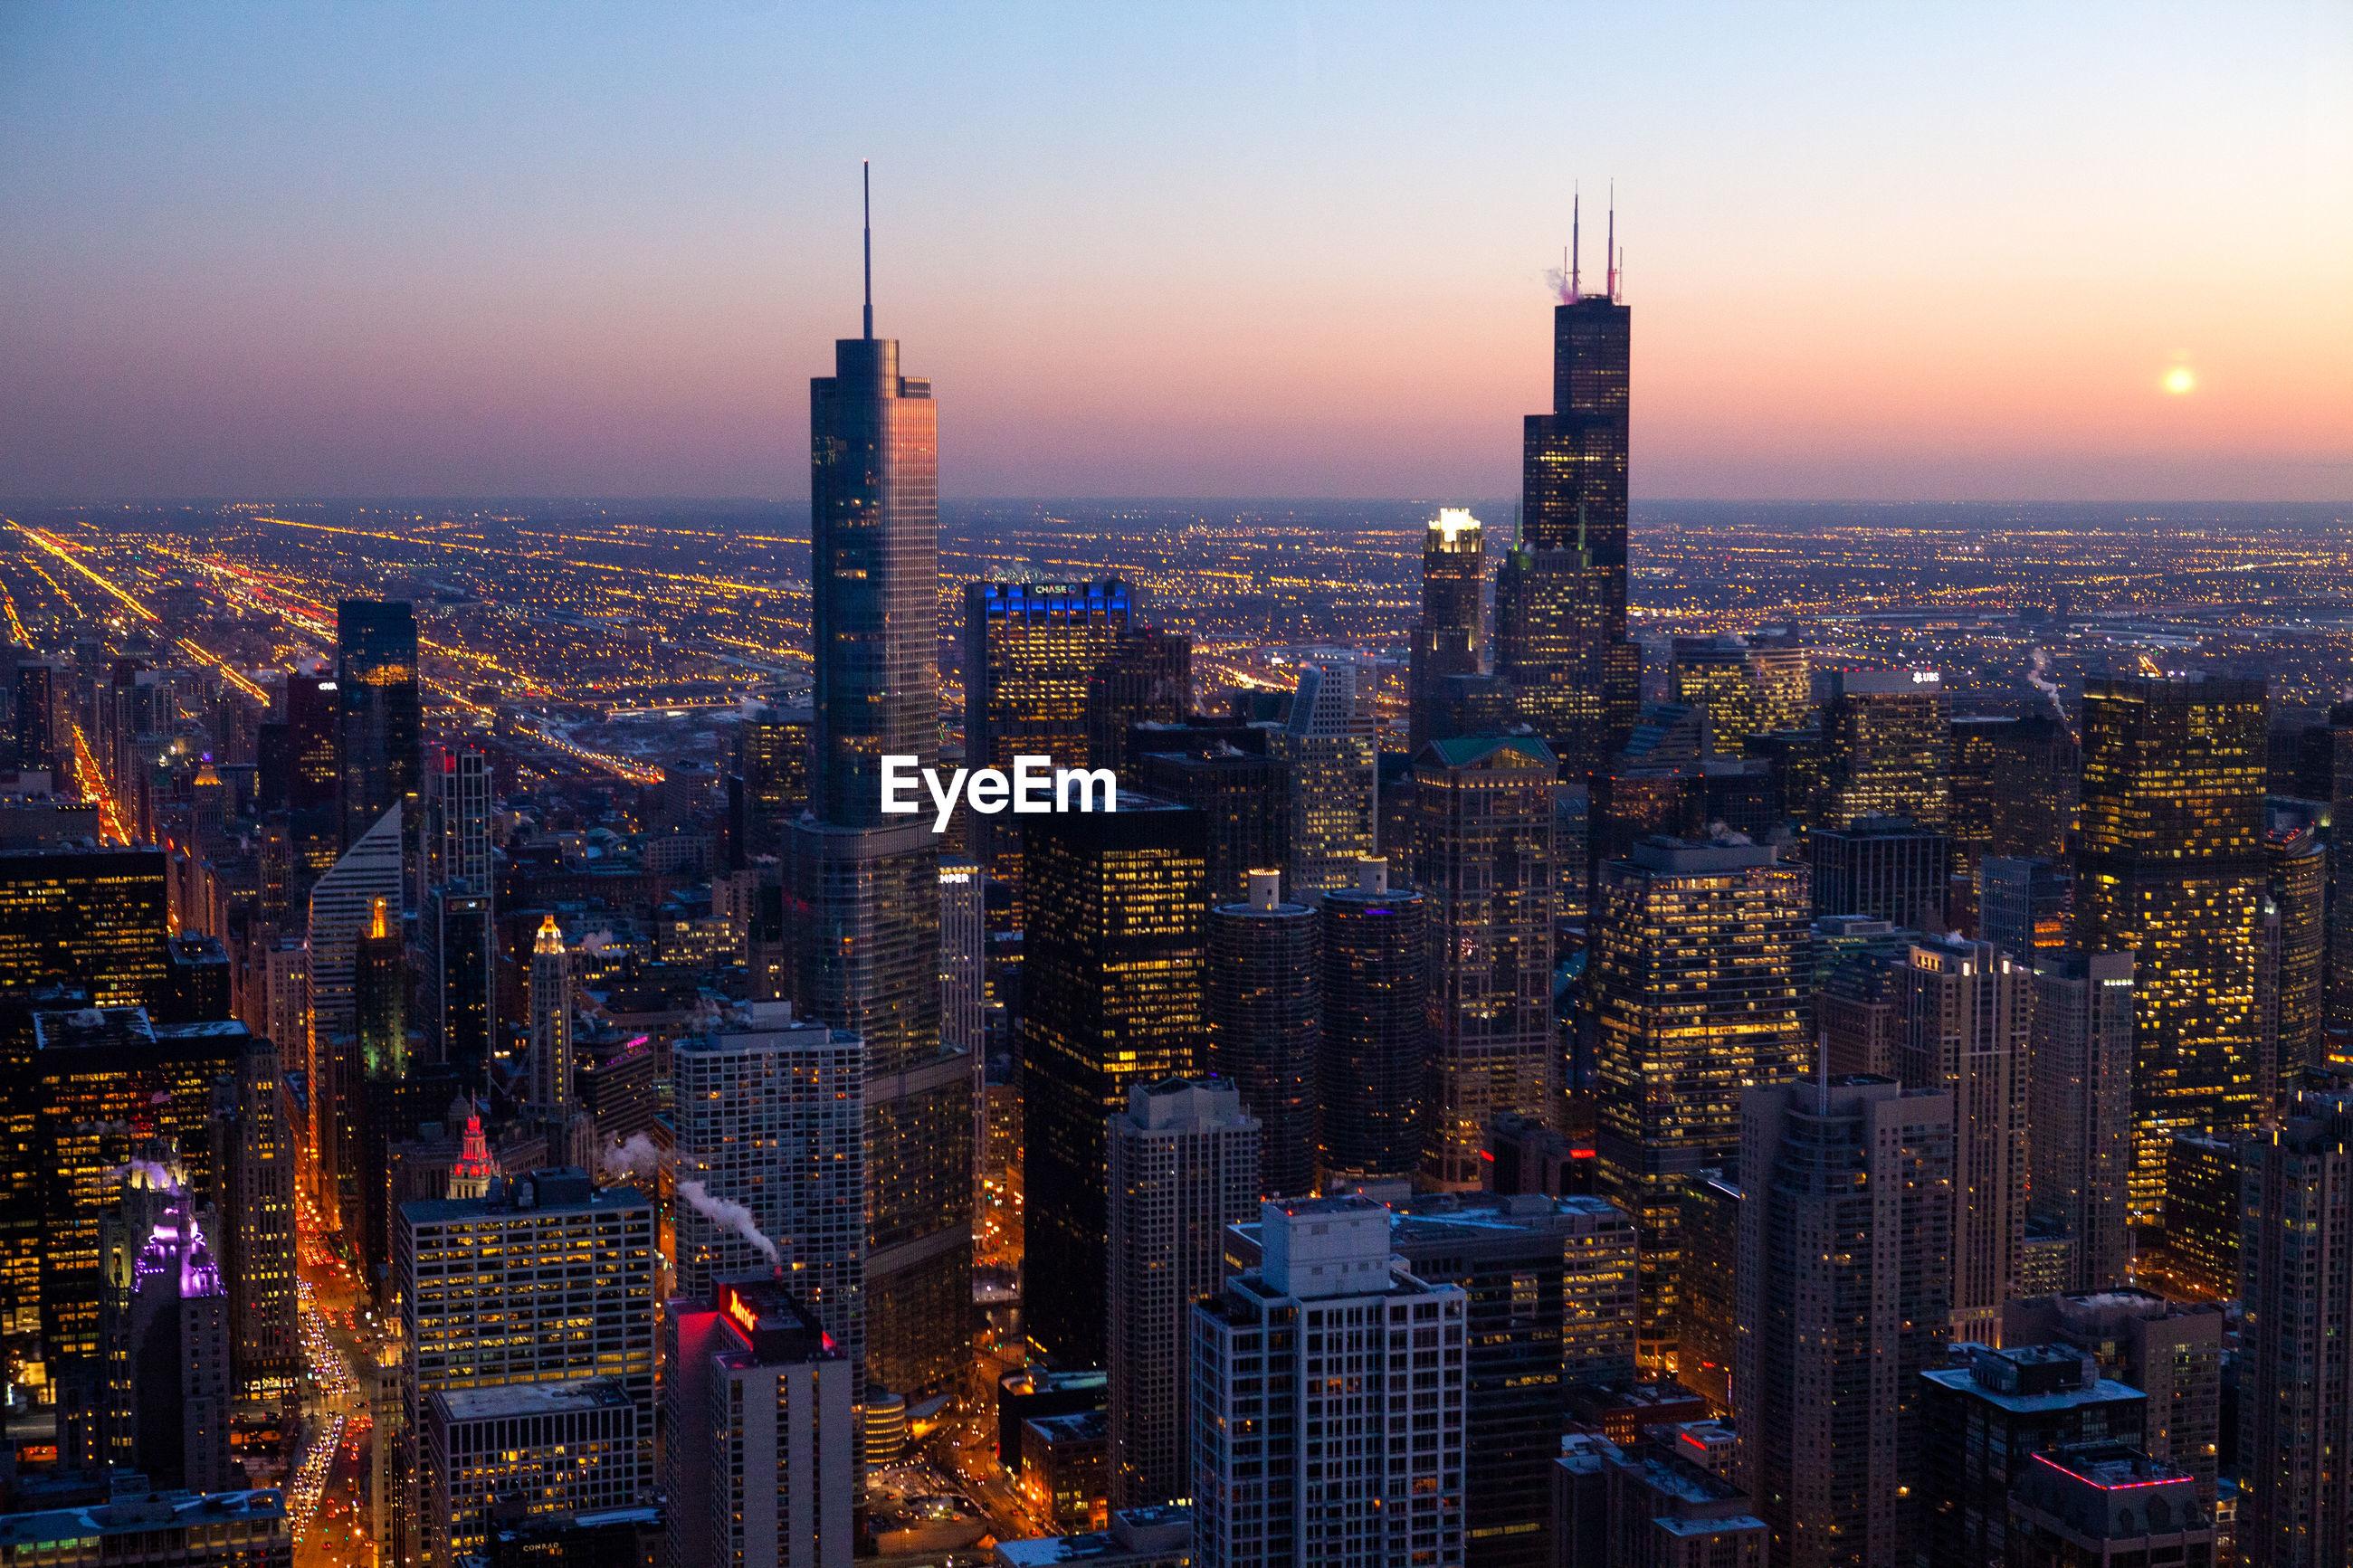 Chicago skyline during sunset